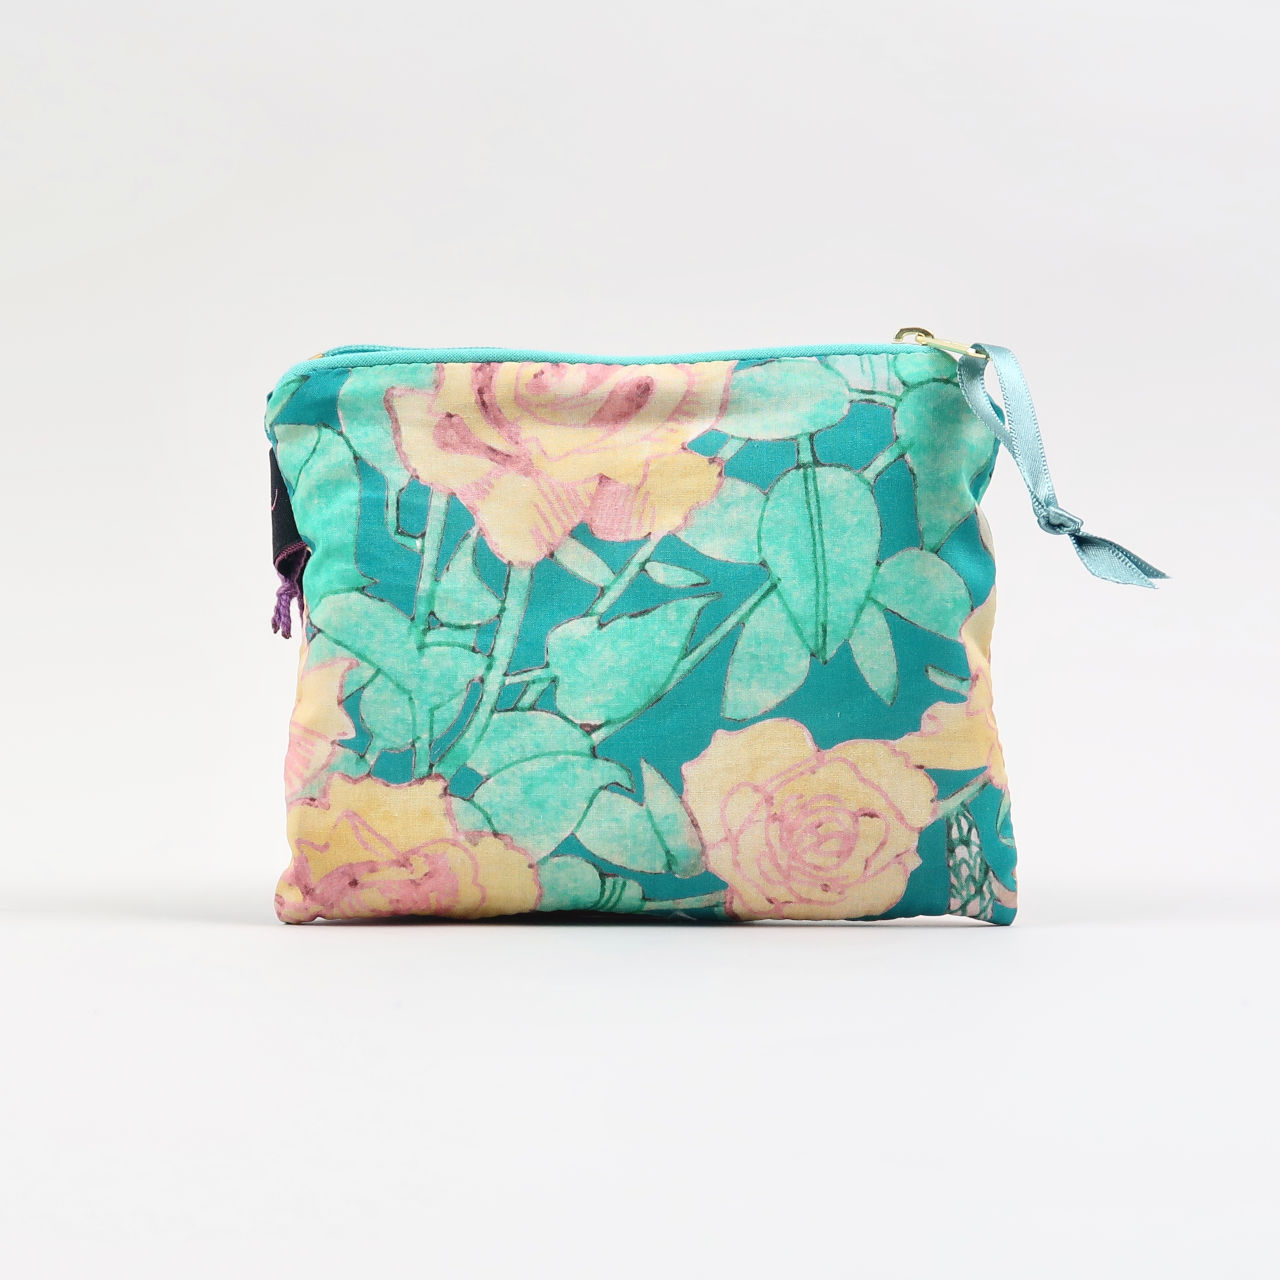 Liberty Print Fabric Purse - Anna's Garden Teal